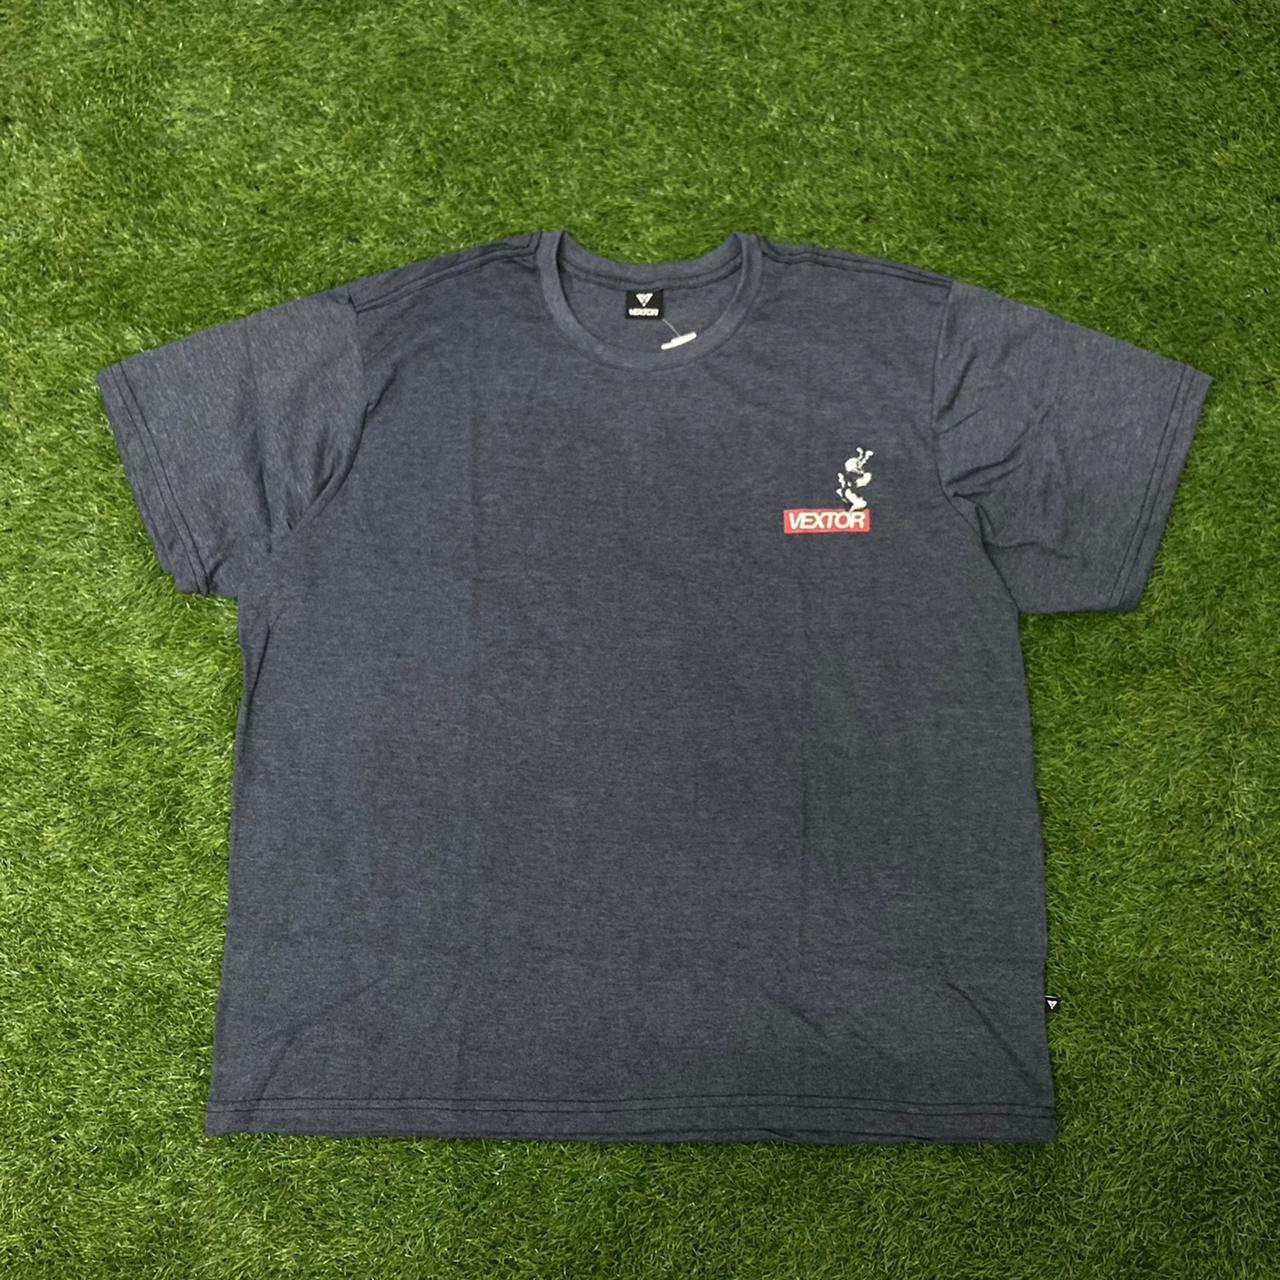 Camiseta vextor extra 3100 azul